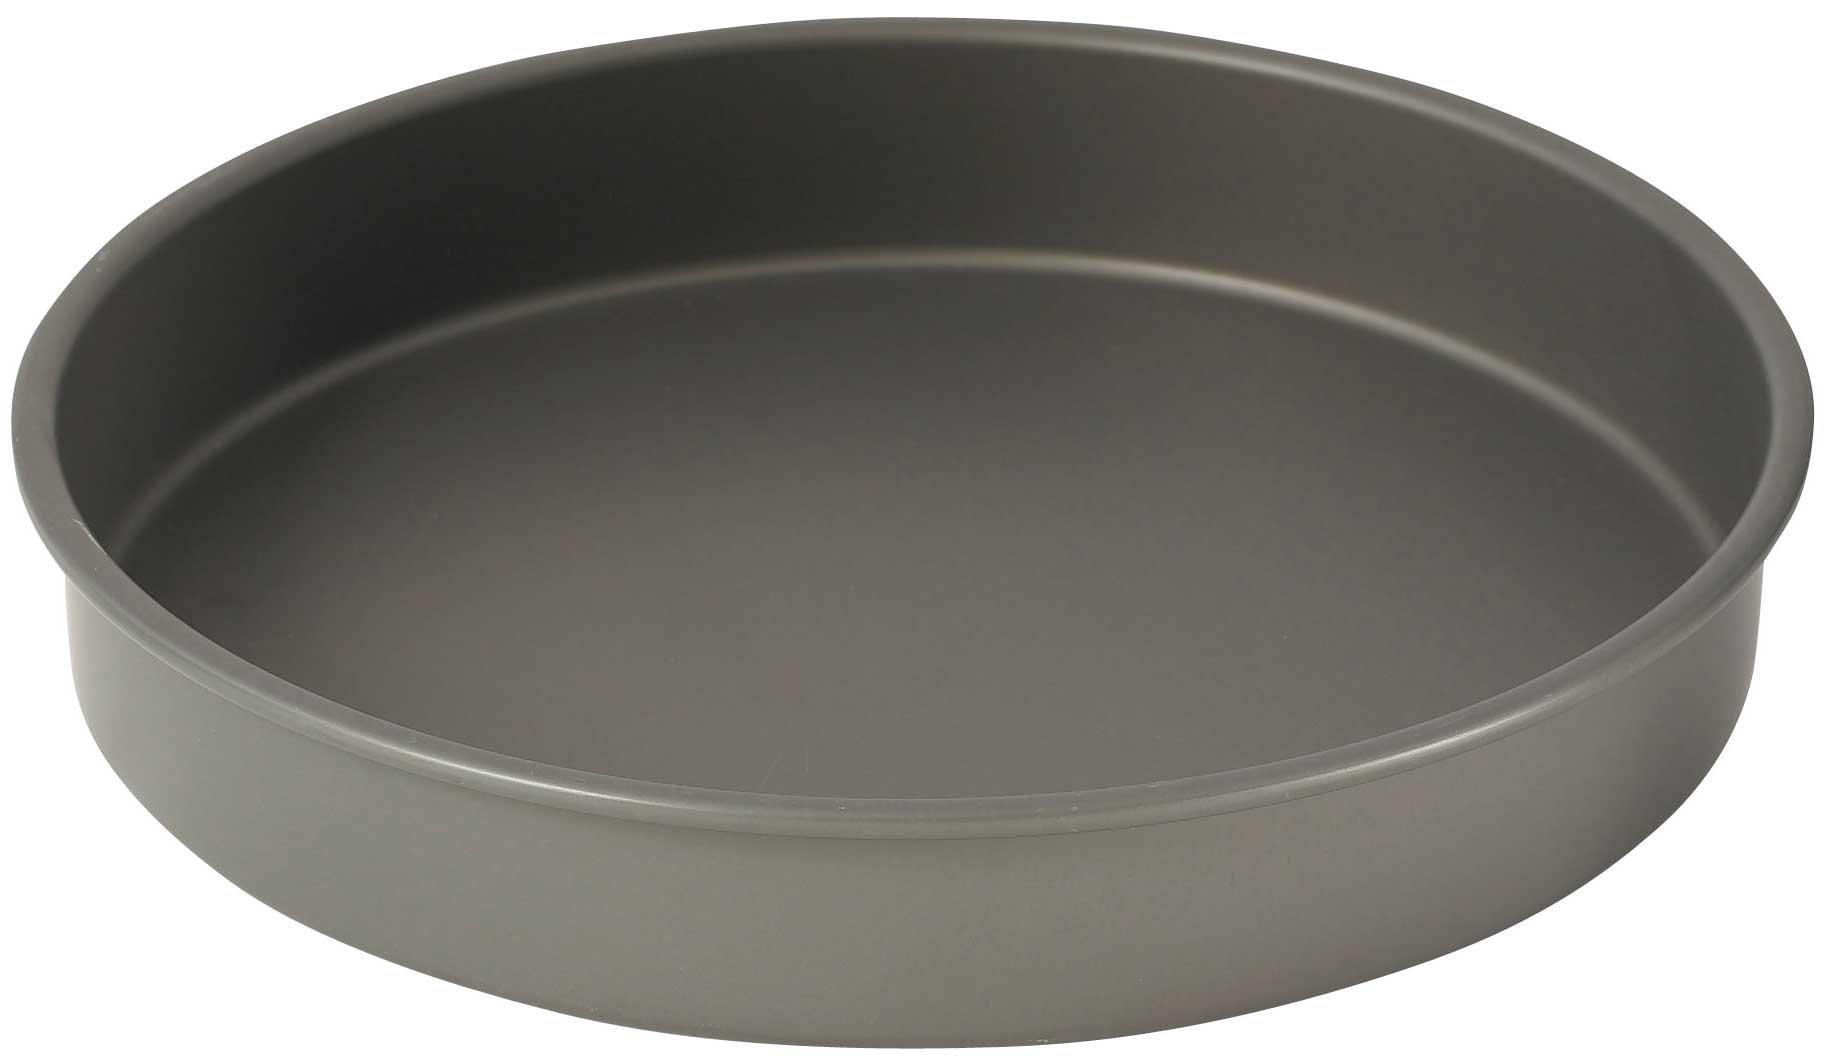 WINCO HAC-122 Round Cake Pan, 12-Inch, Hard Anodized Aluminum